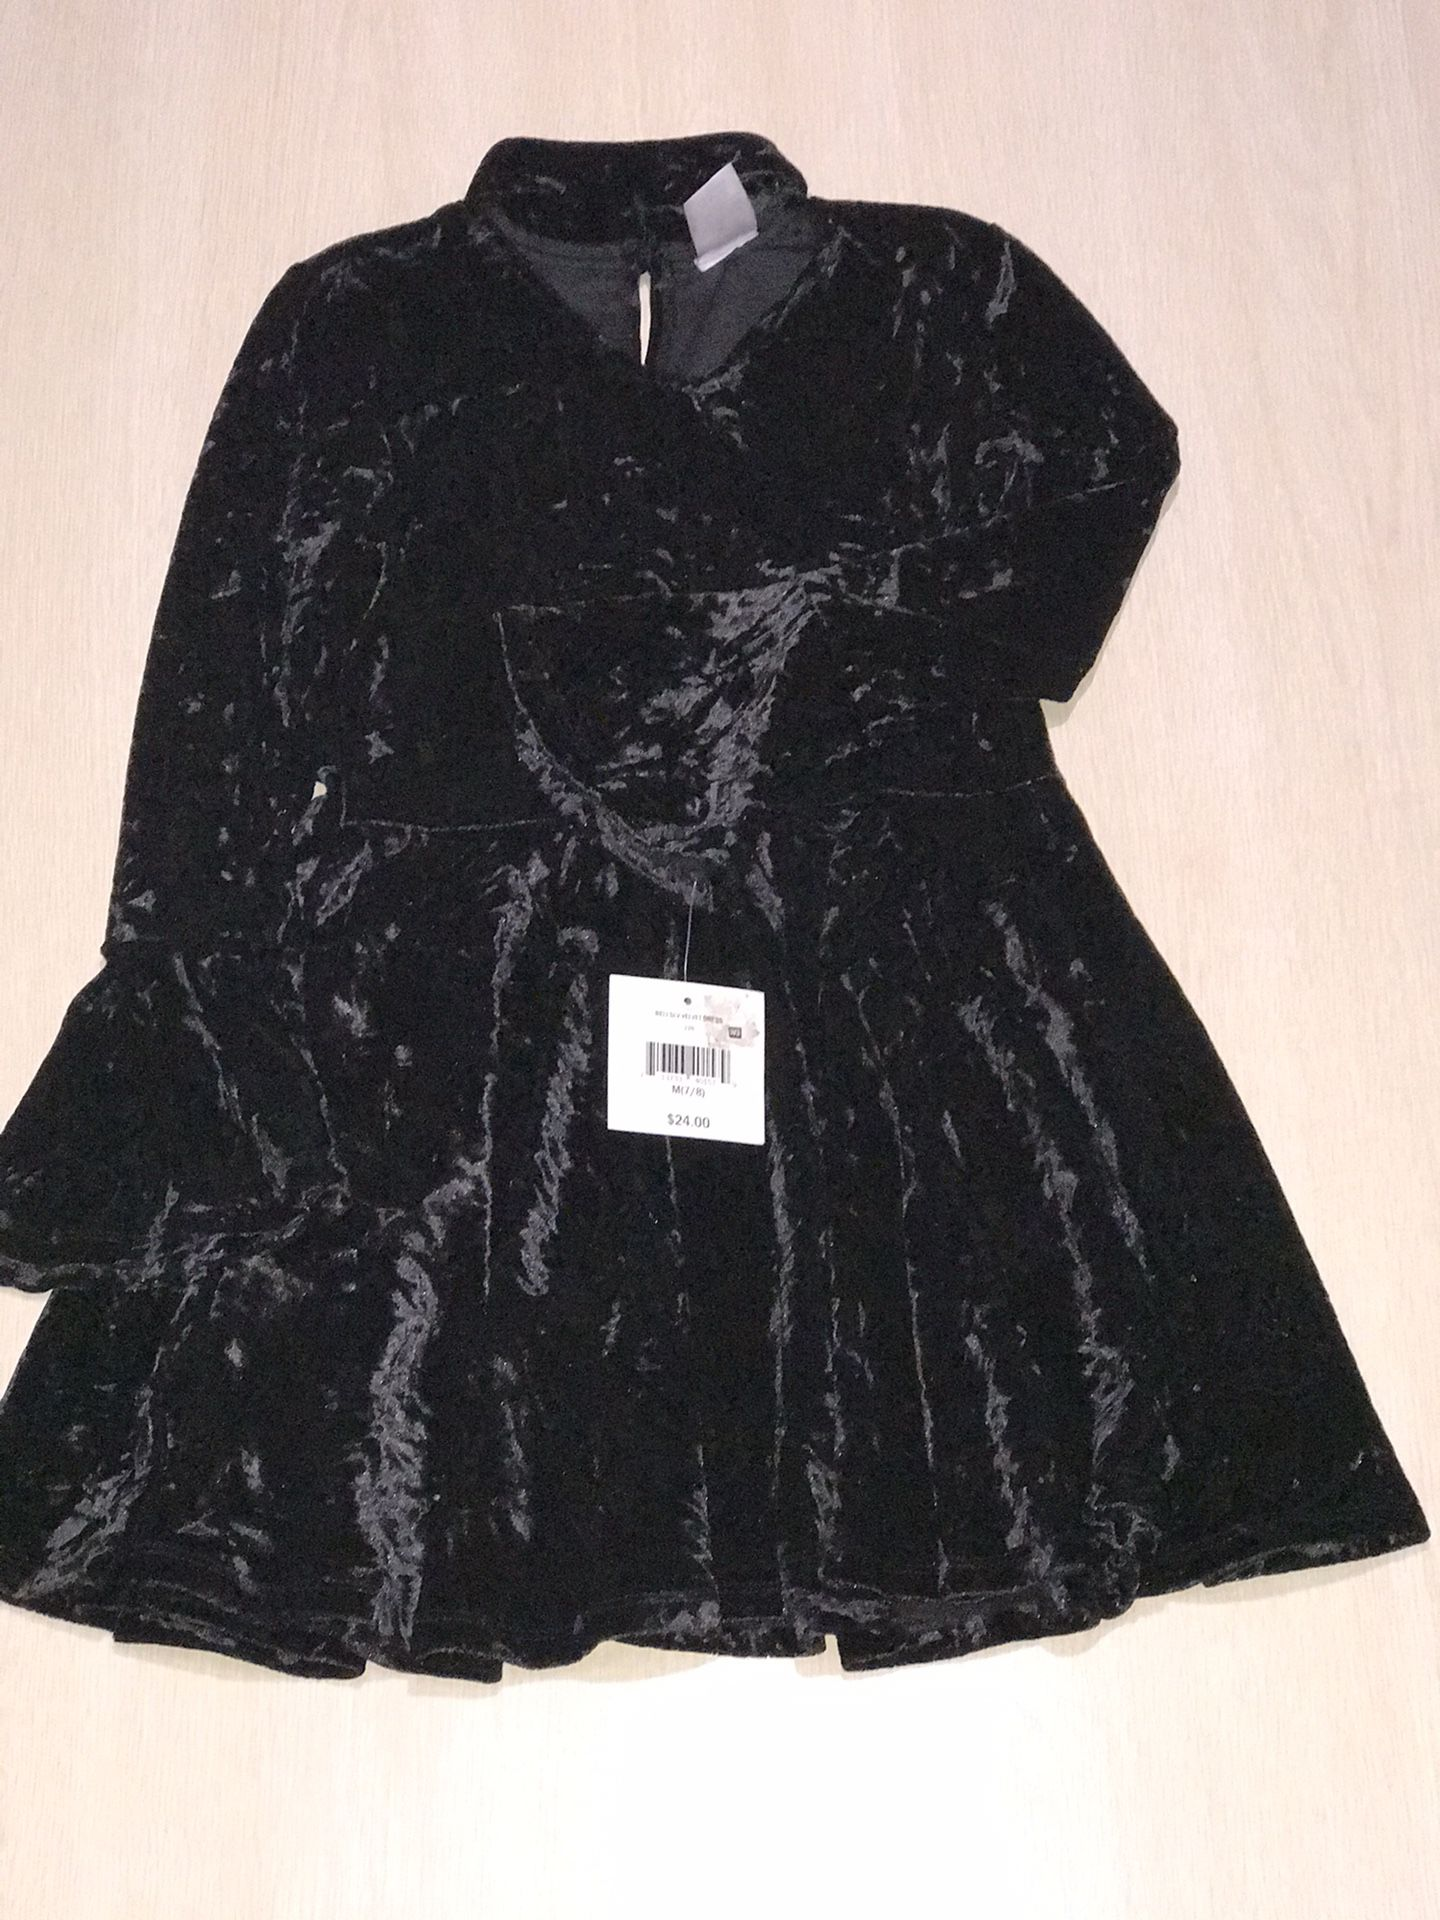 Falls creek girls dress new $7firm price